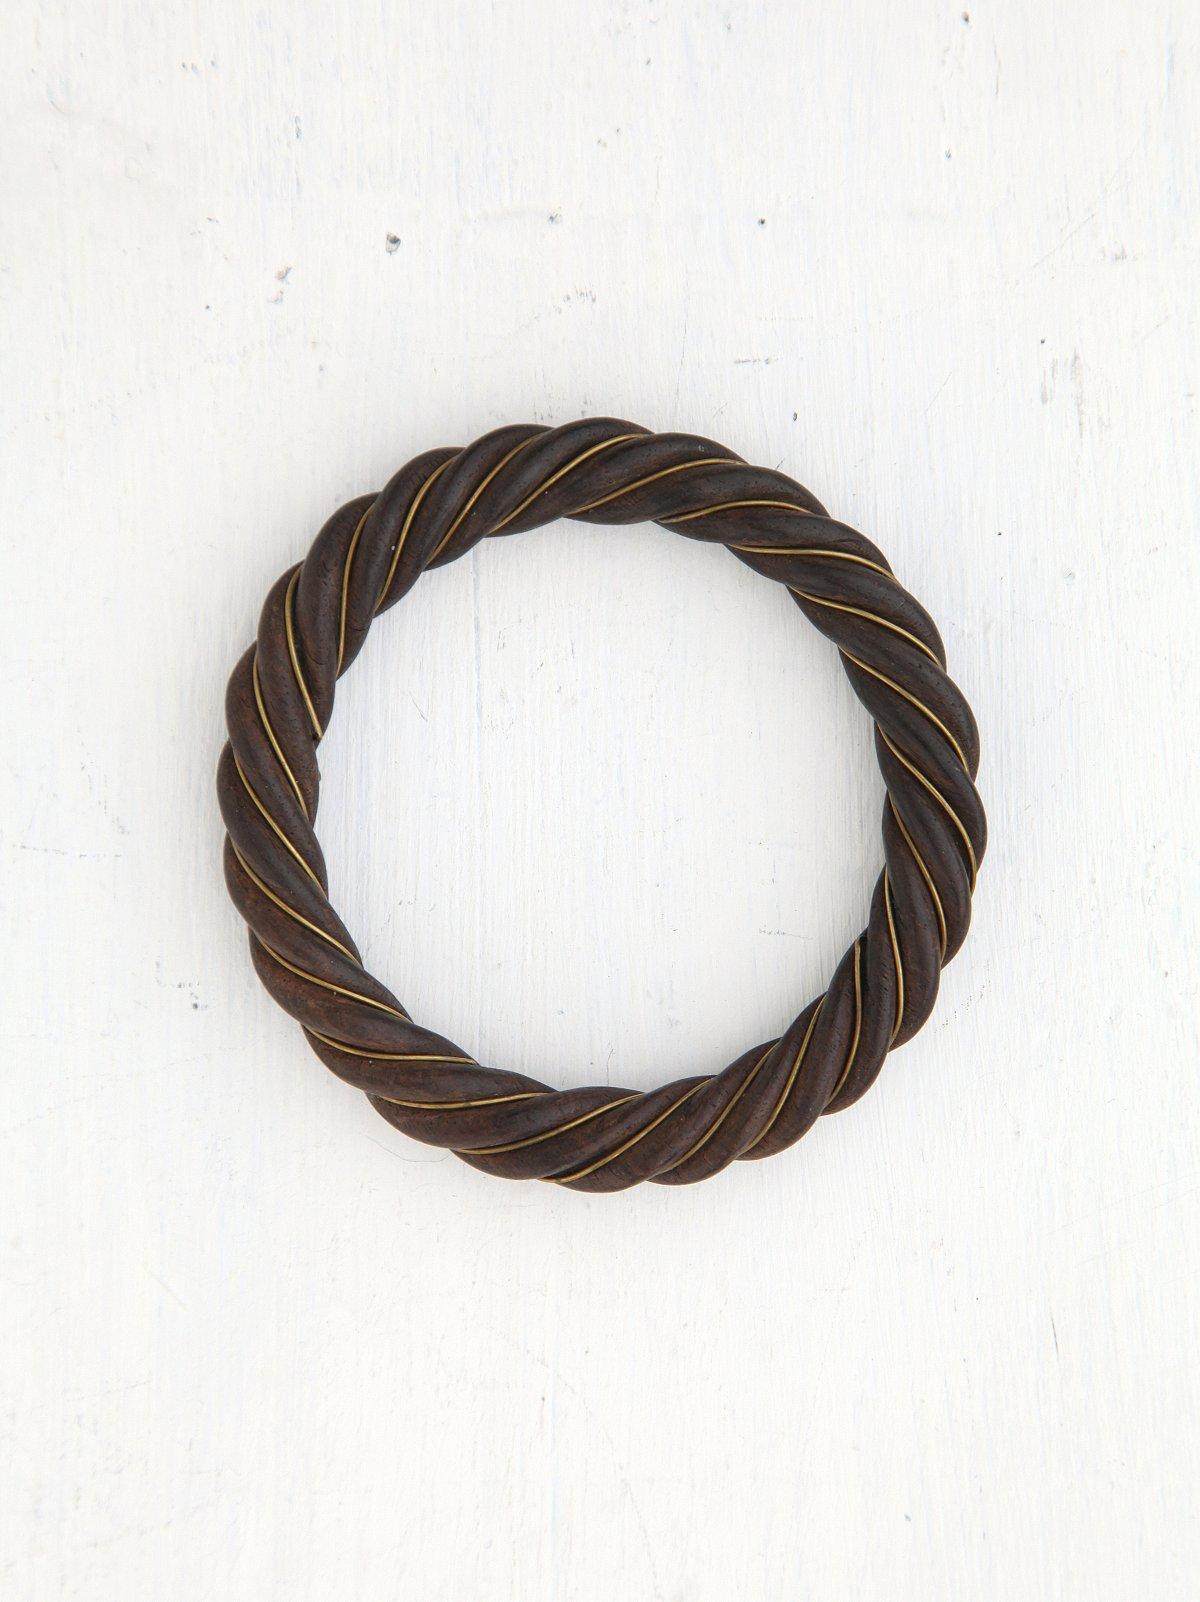 Vintage Twisted Wood Bangle